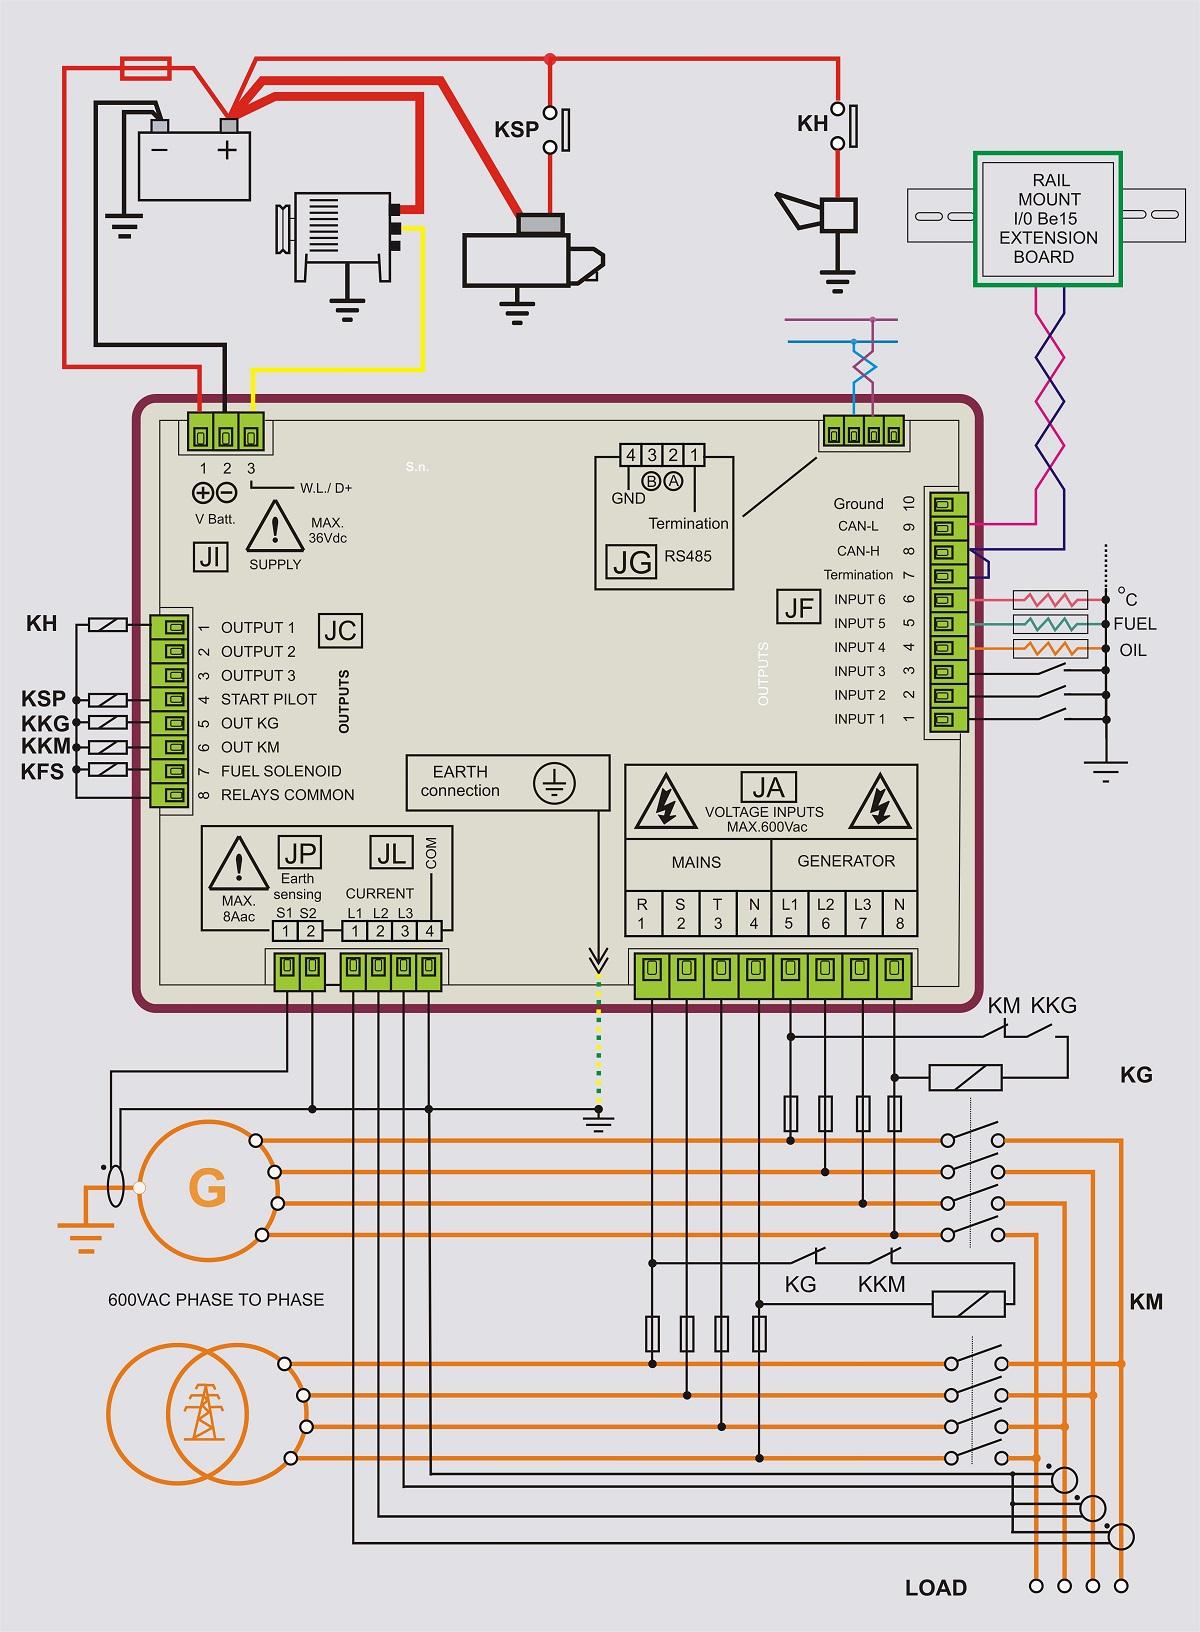 waterway champion wiring diagram wiring library  waterway champion wiring diagram #1